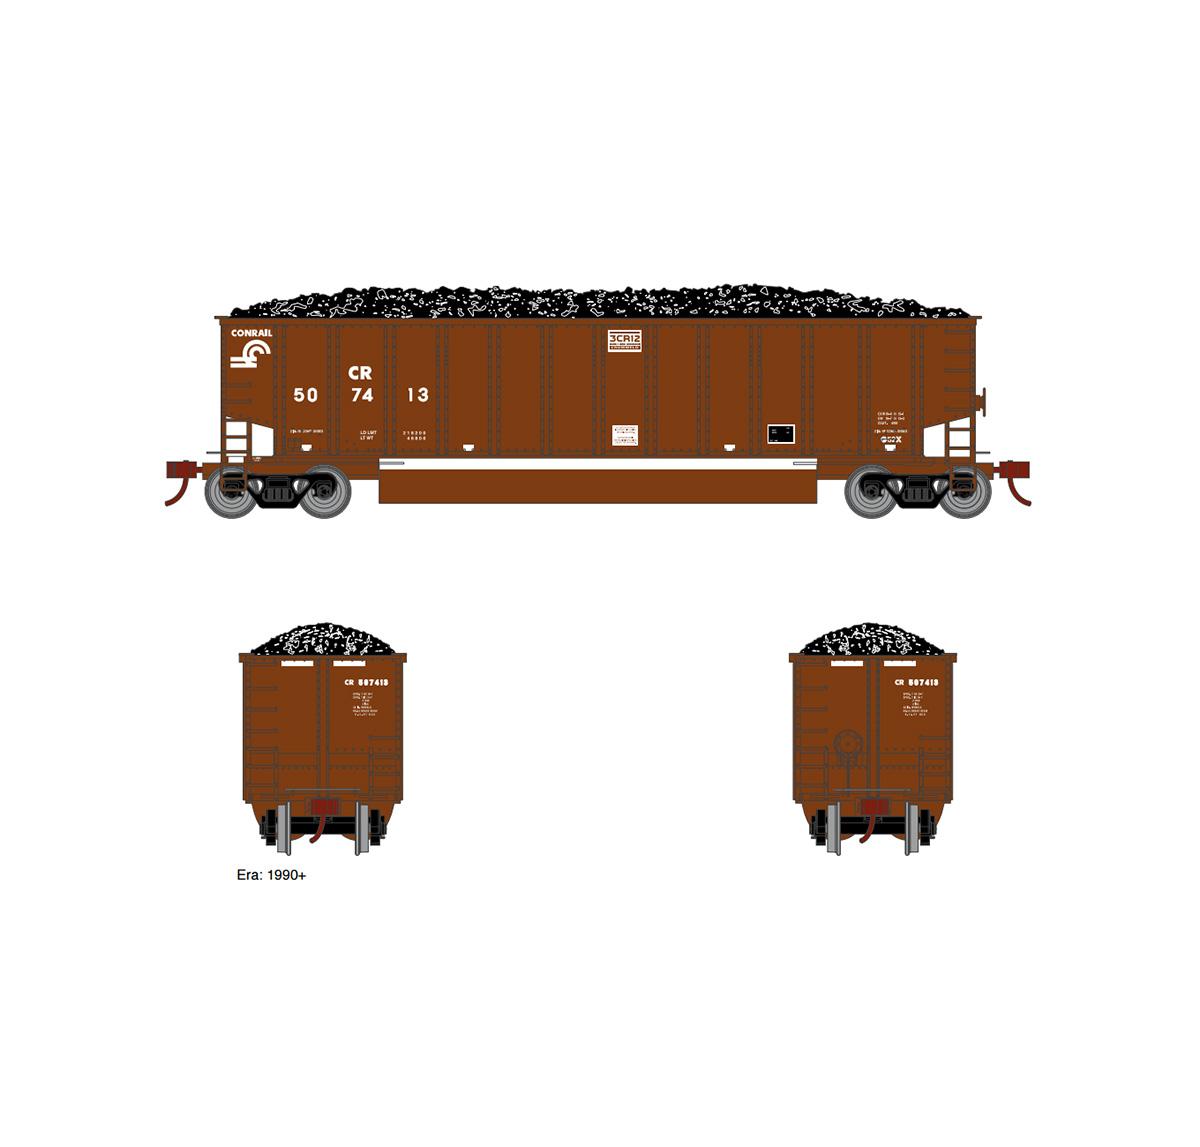 athearn_bethgon_coalporter_w-load_cr_507413